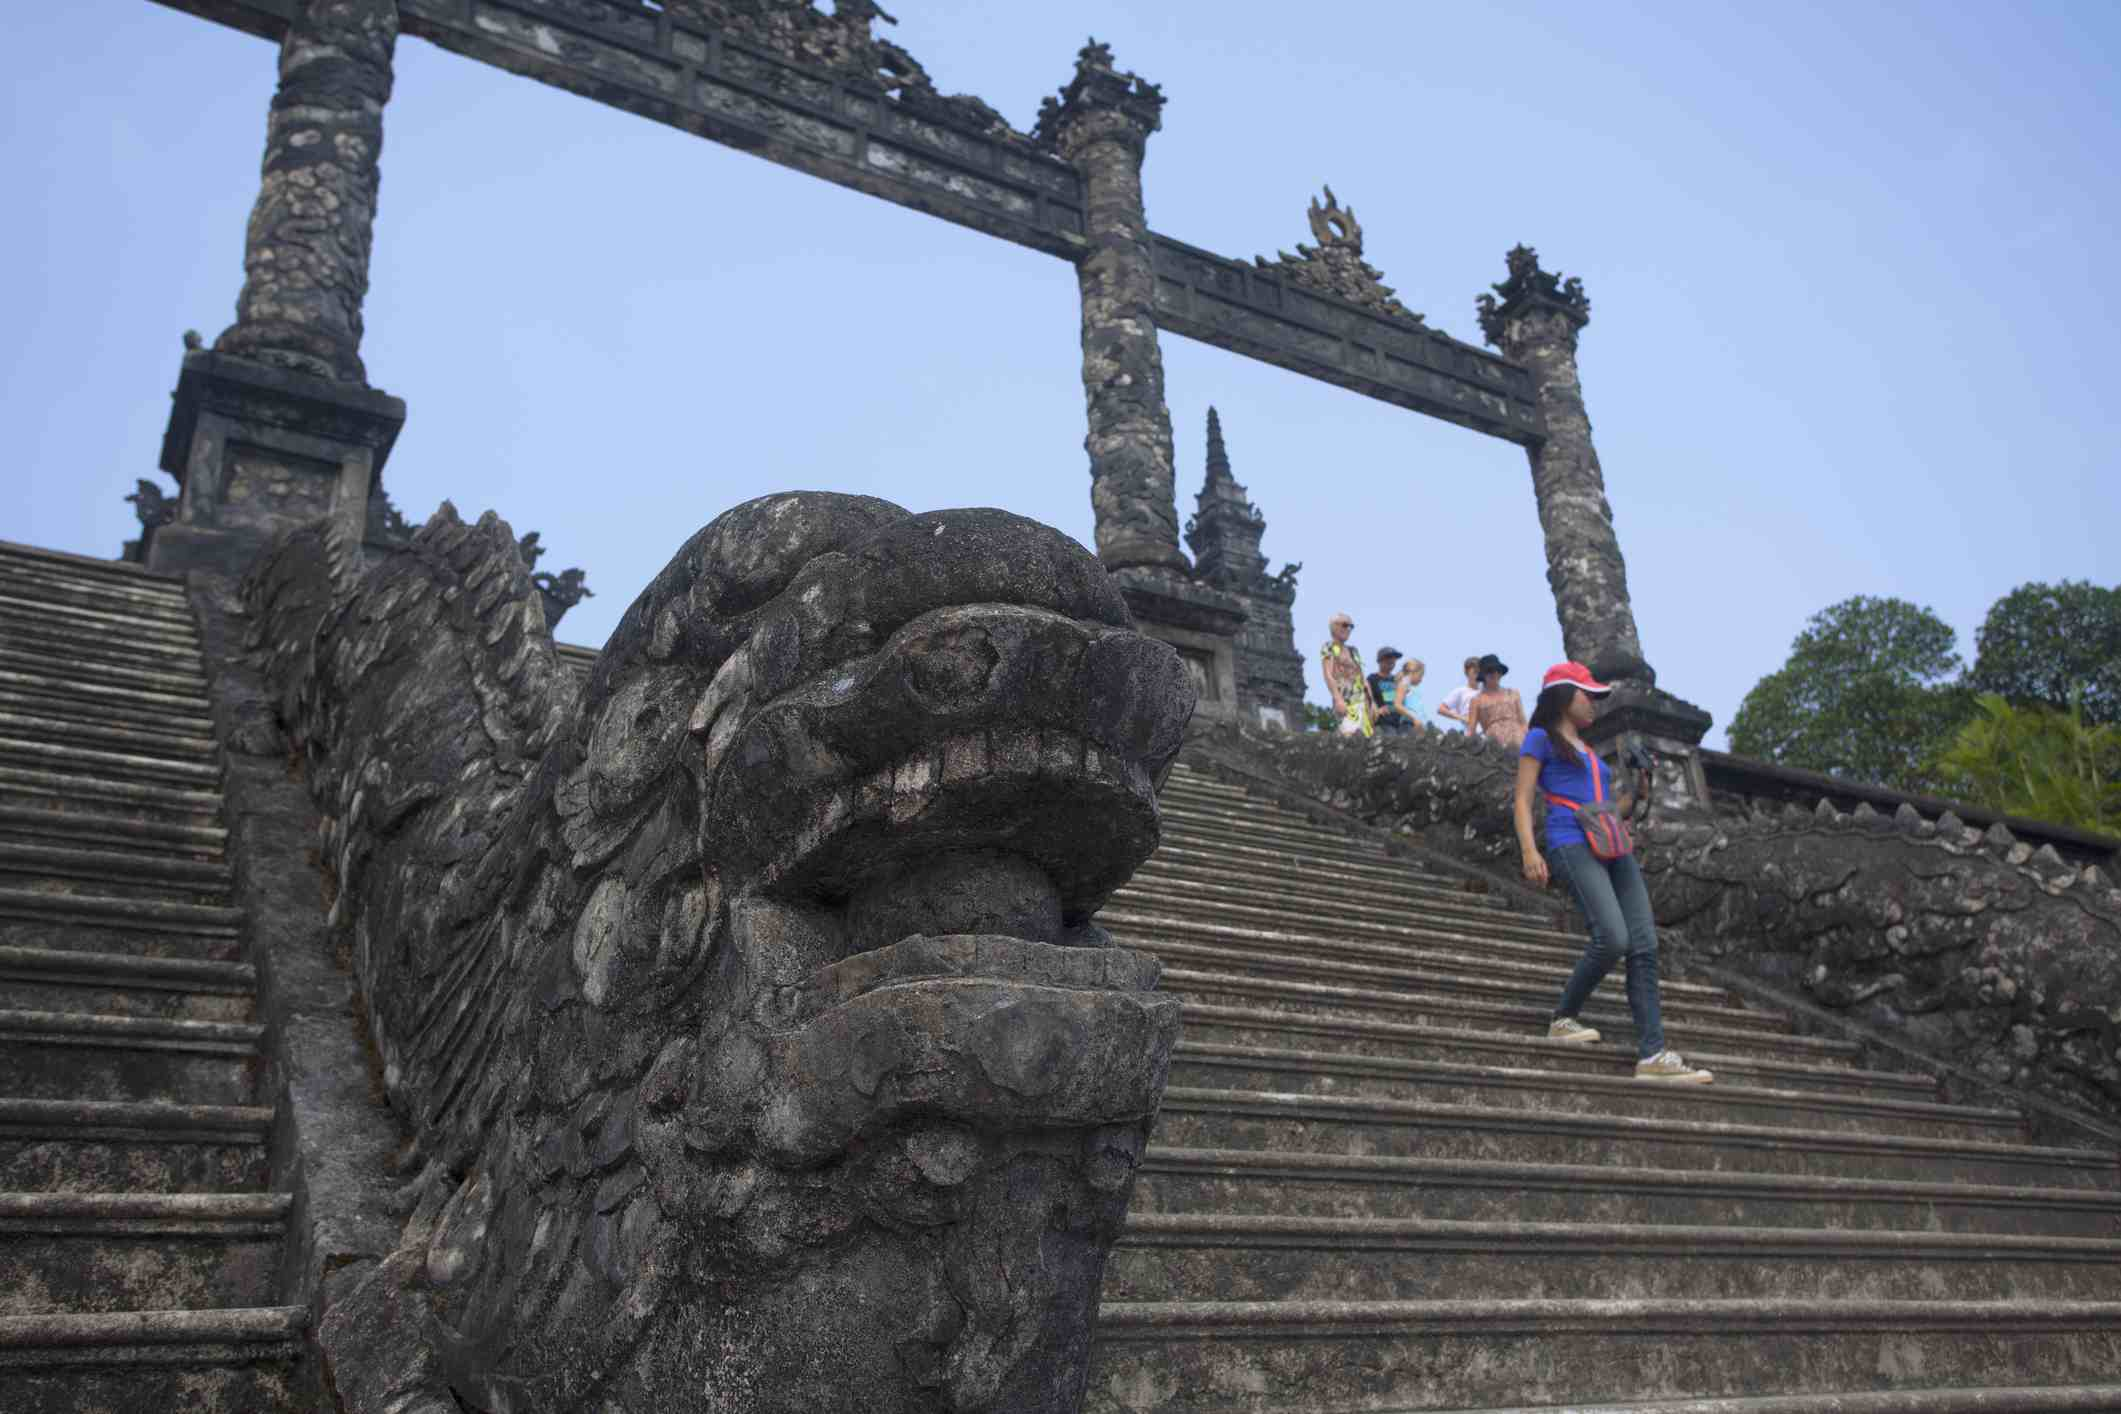 Dragon guarding the forecourt, Khai Dinh Royal Tomb, Hue, Vietnam.